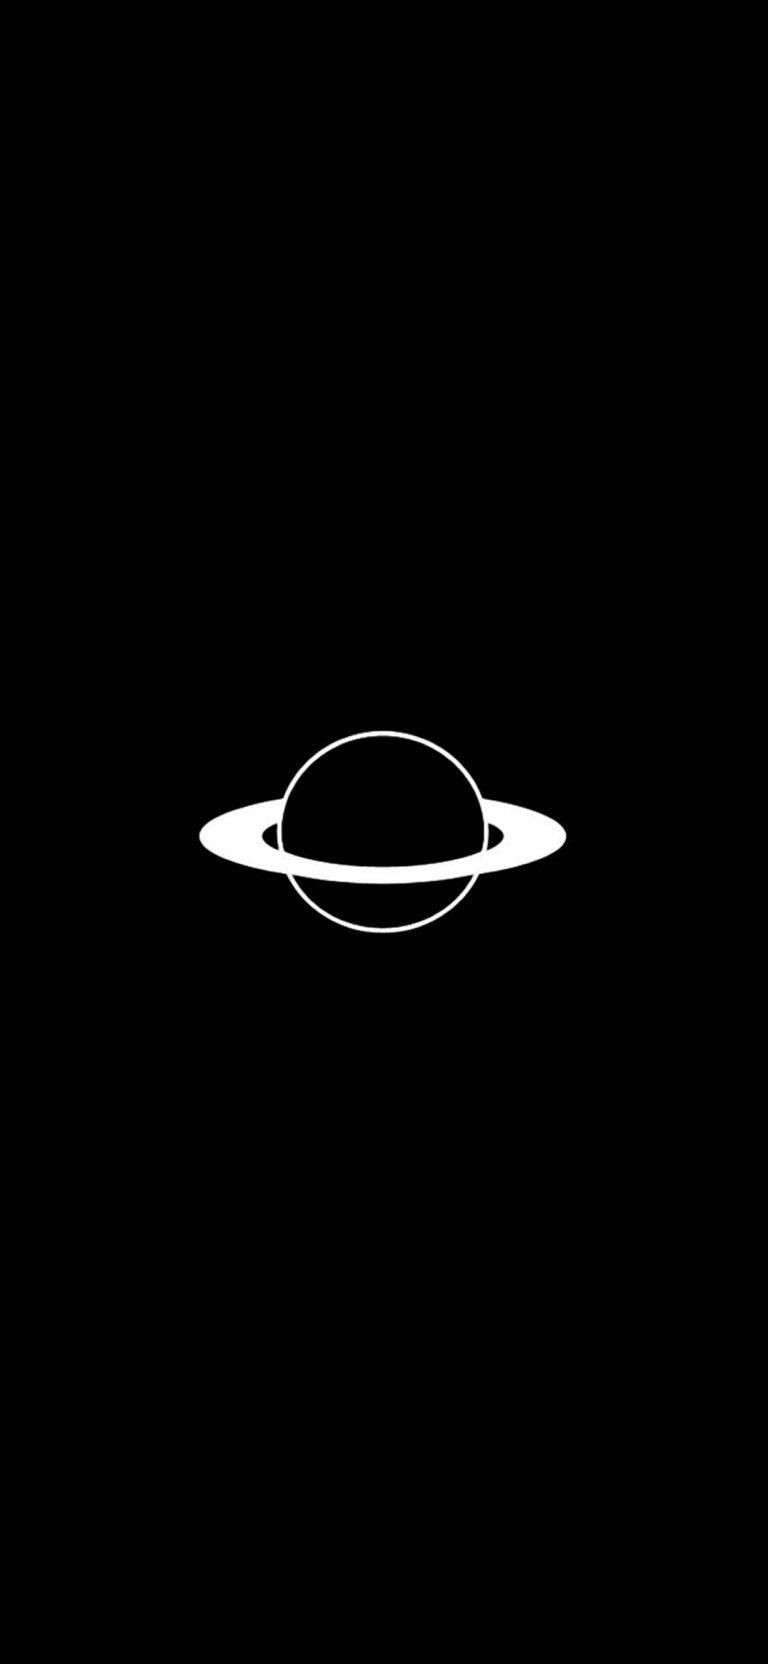 Space Phone Wallpaper 001 1080x2340 768x1664